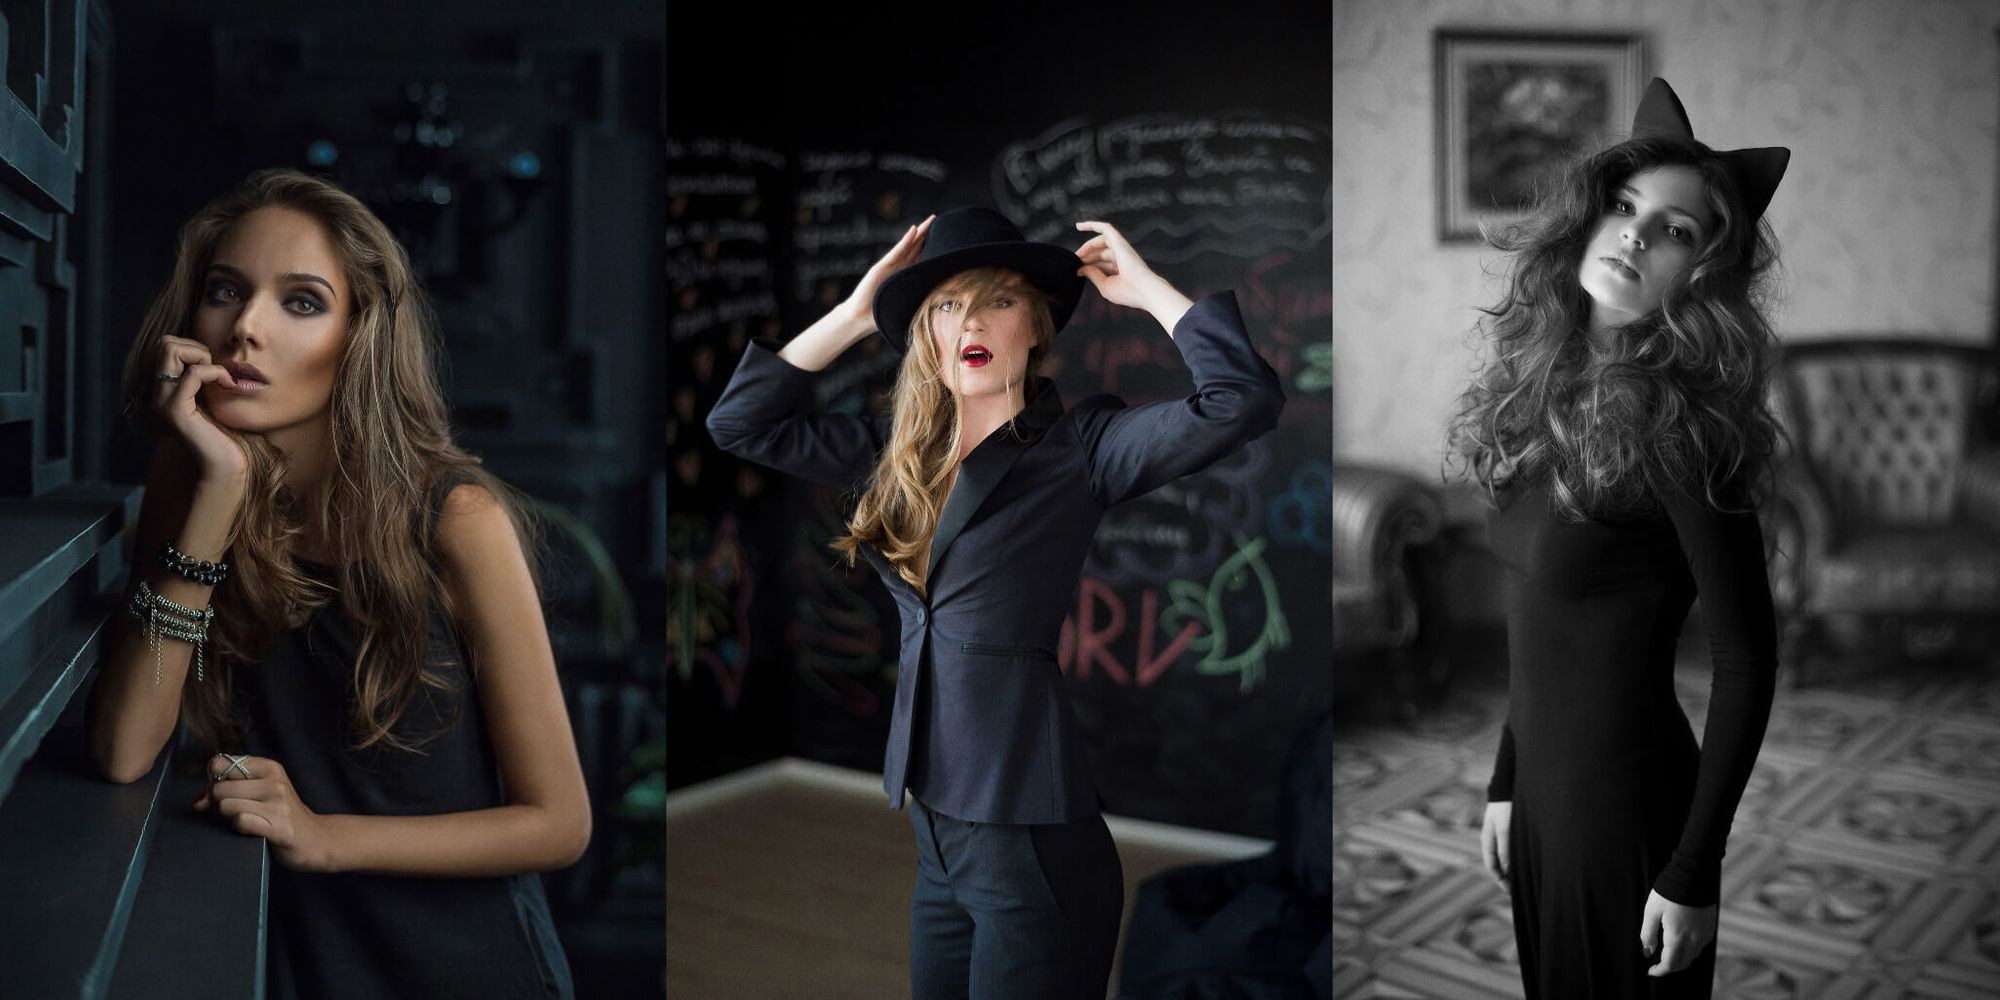 Сколько стоит работа модели на фотосессии ира из топ девушка модель по украински